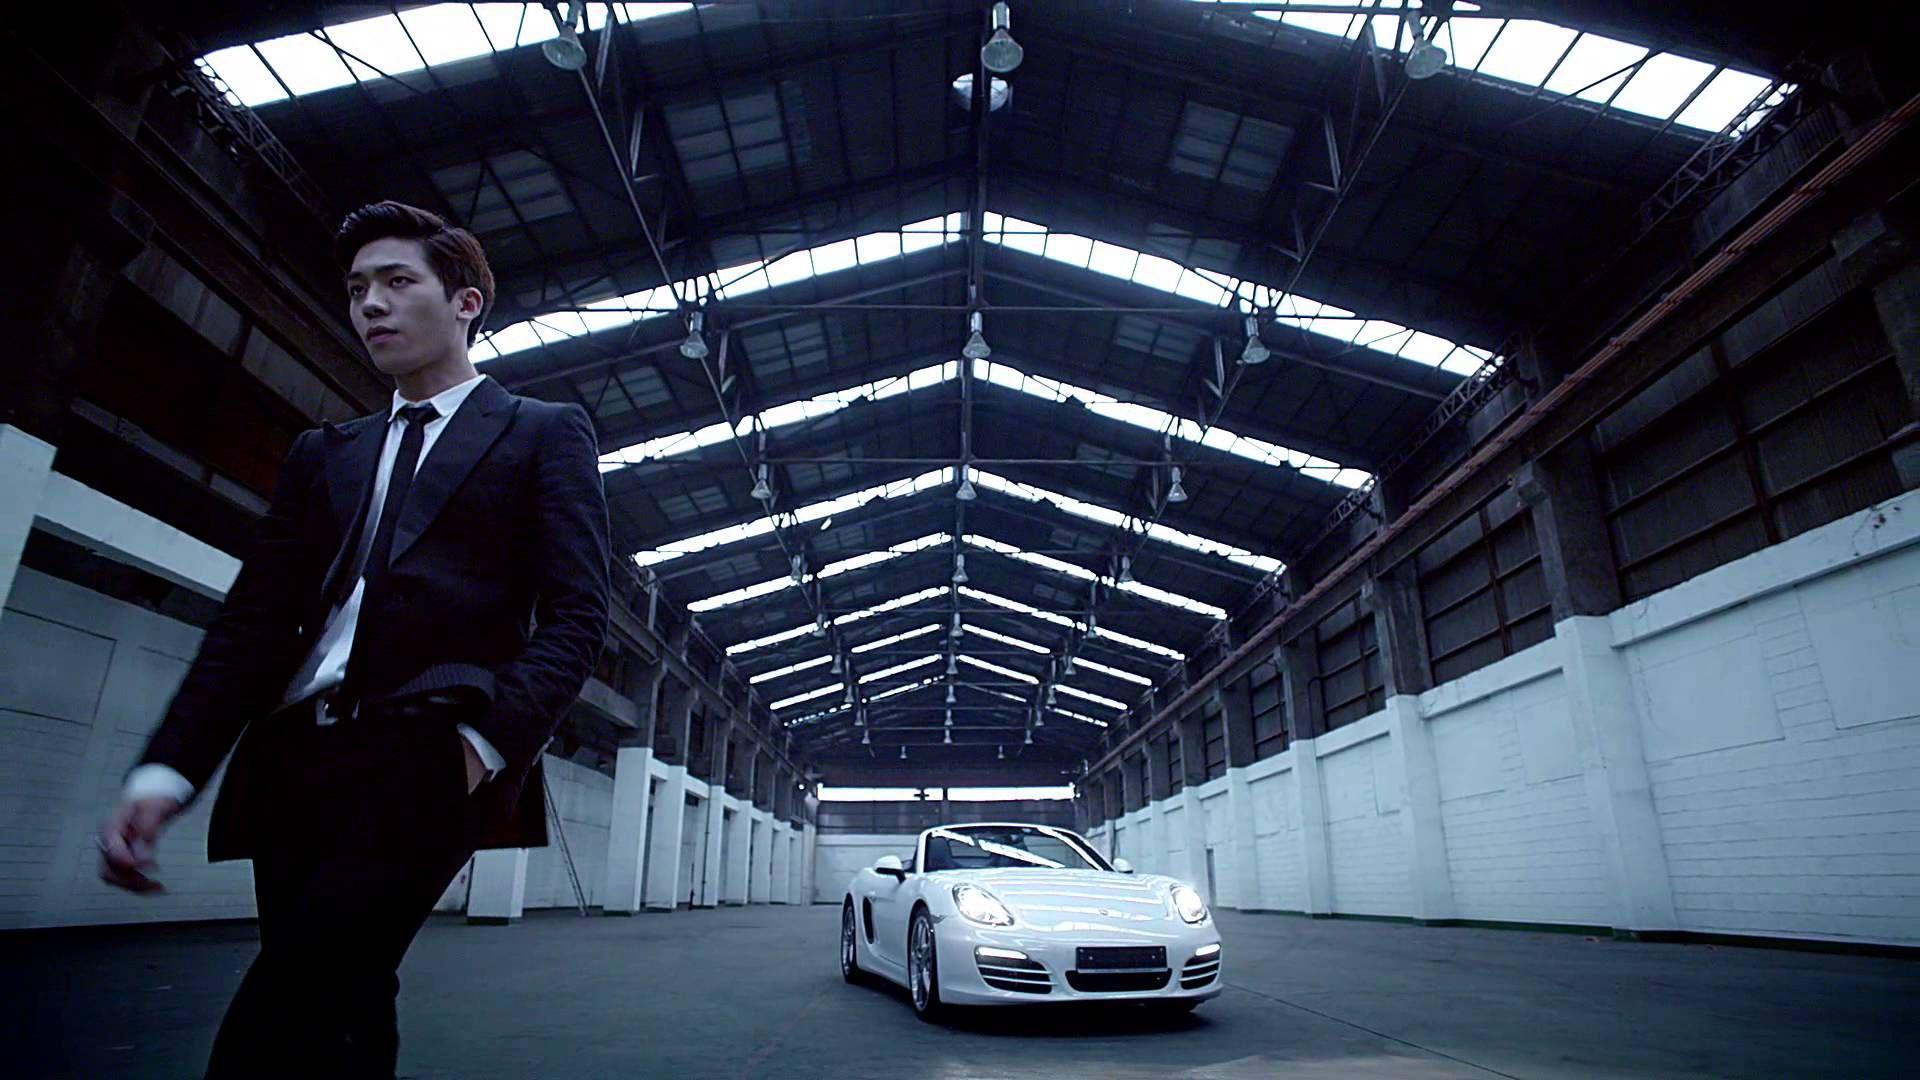 [Teaser] TEEN TOP(틴탑) _ I'm Sorry(우린 문제 없어)